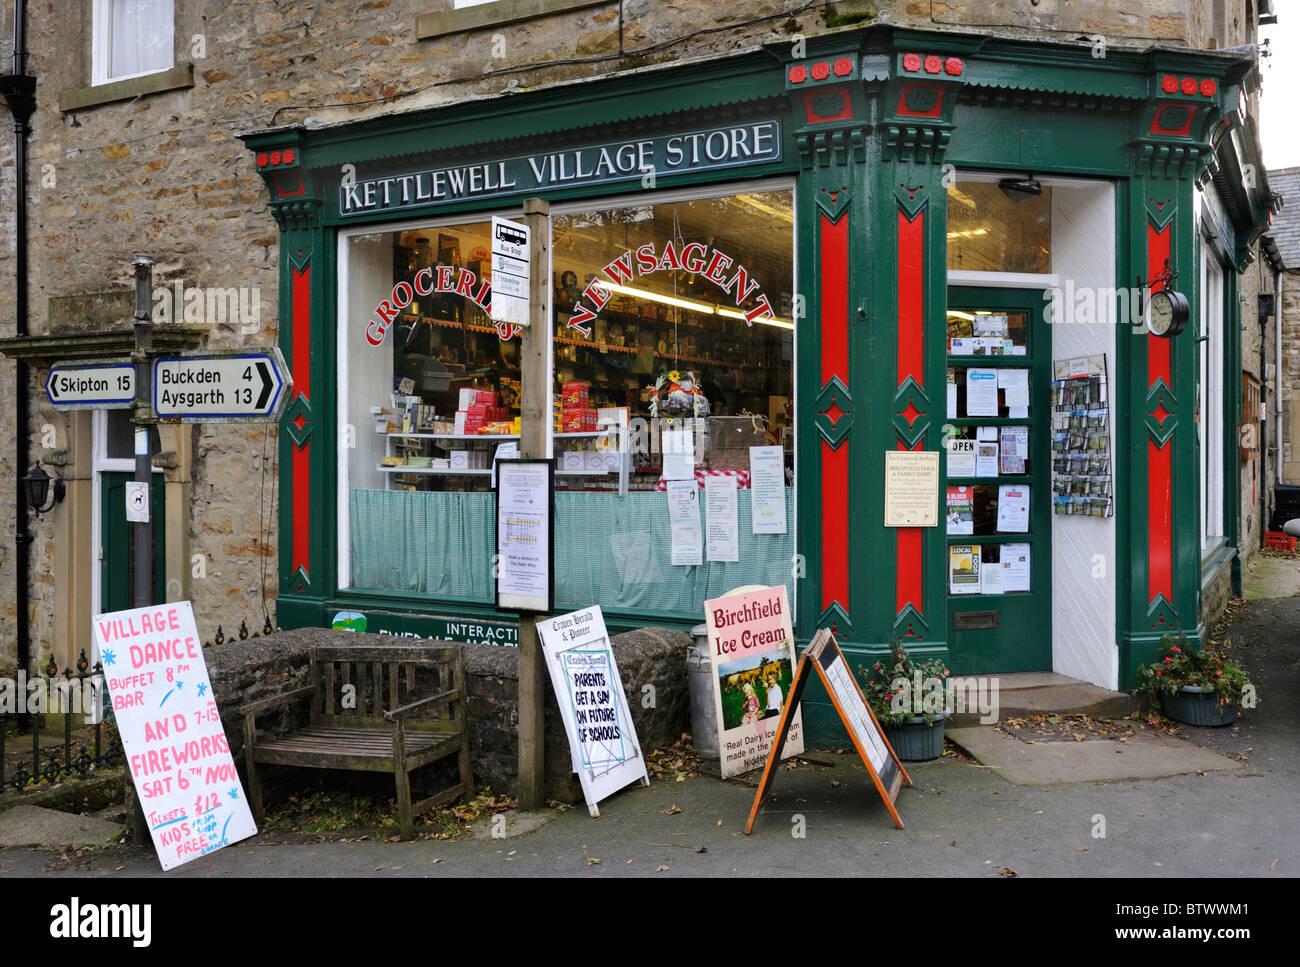 Der Dorfladen in dem Dorf Kettlewell, Wharfedale, Yorkshire Dales National Park, England. Stockbild